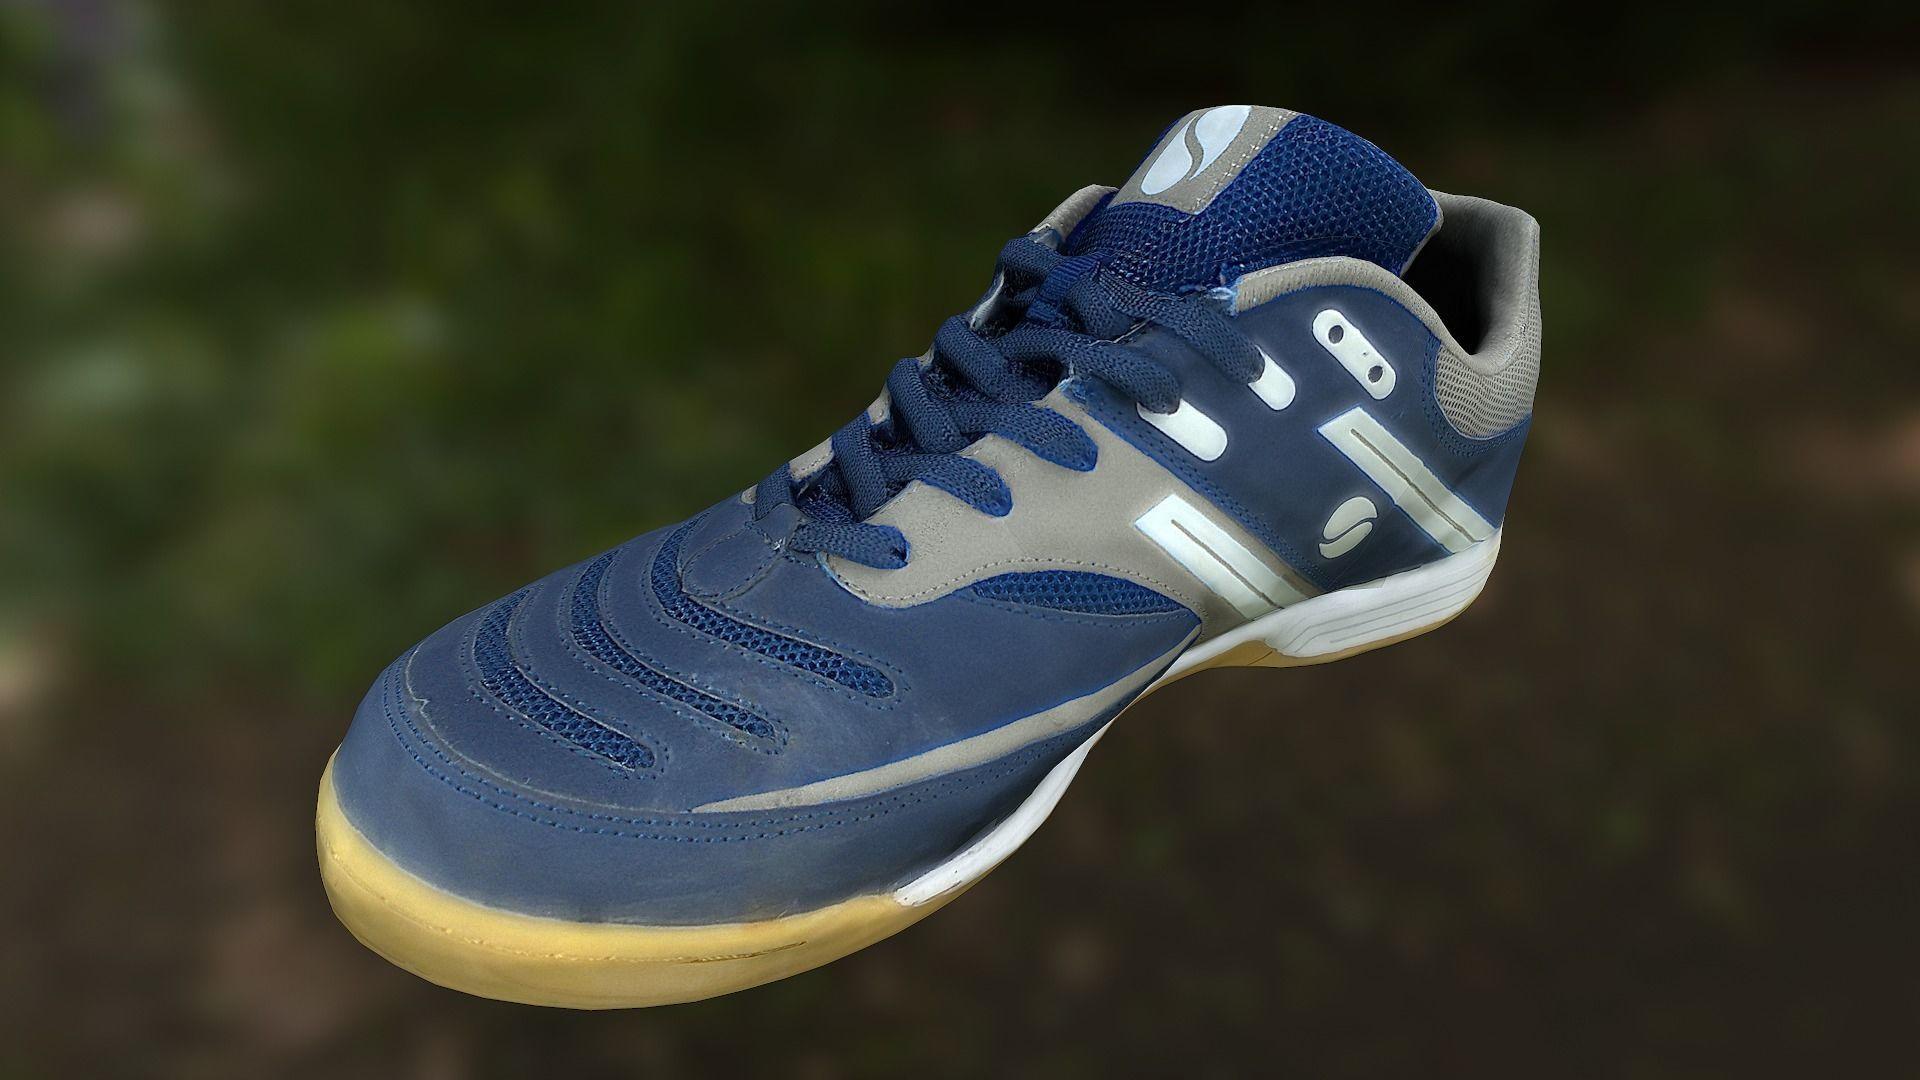 Sport shoe low poly 3D model